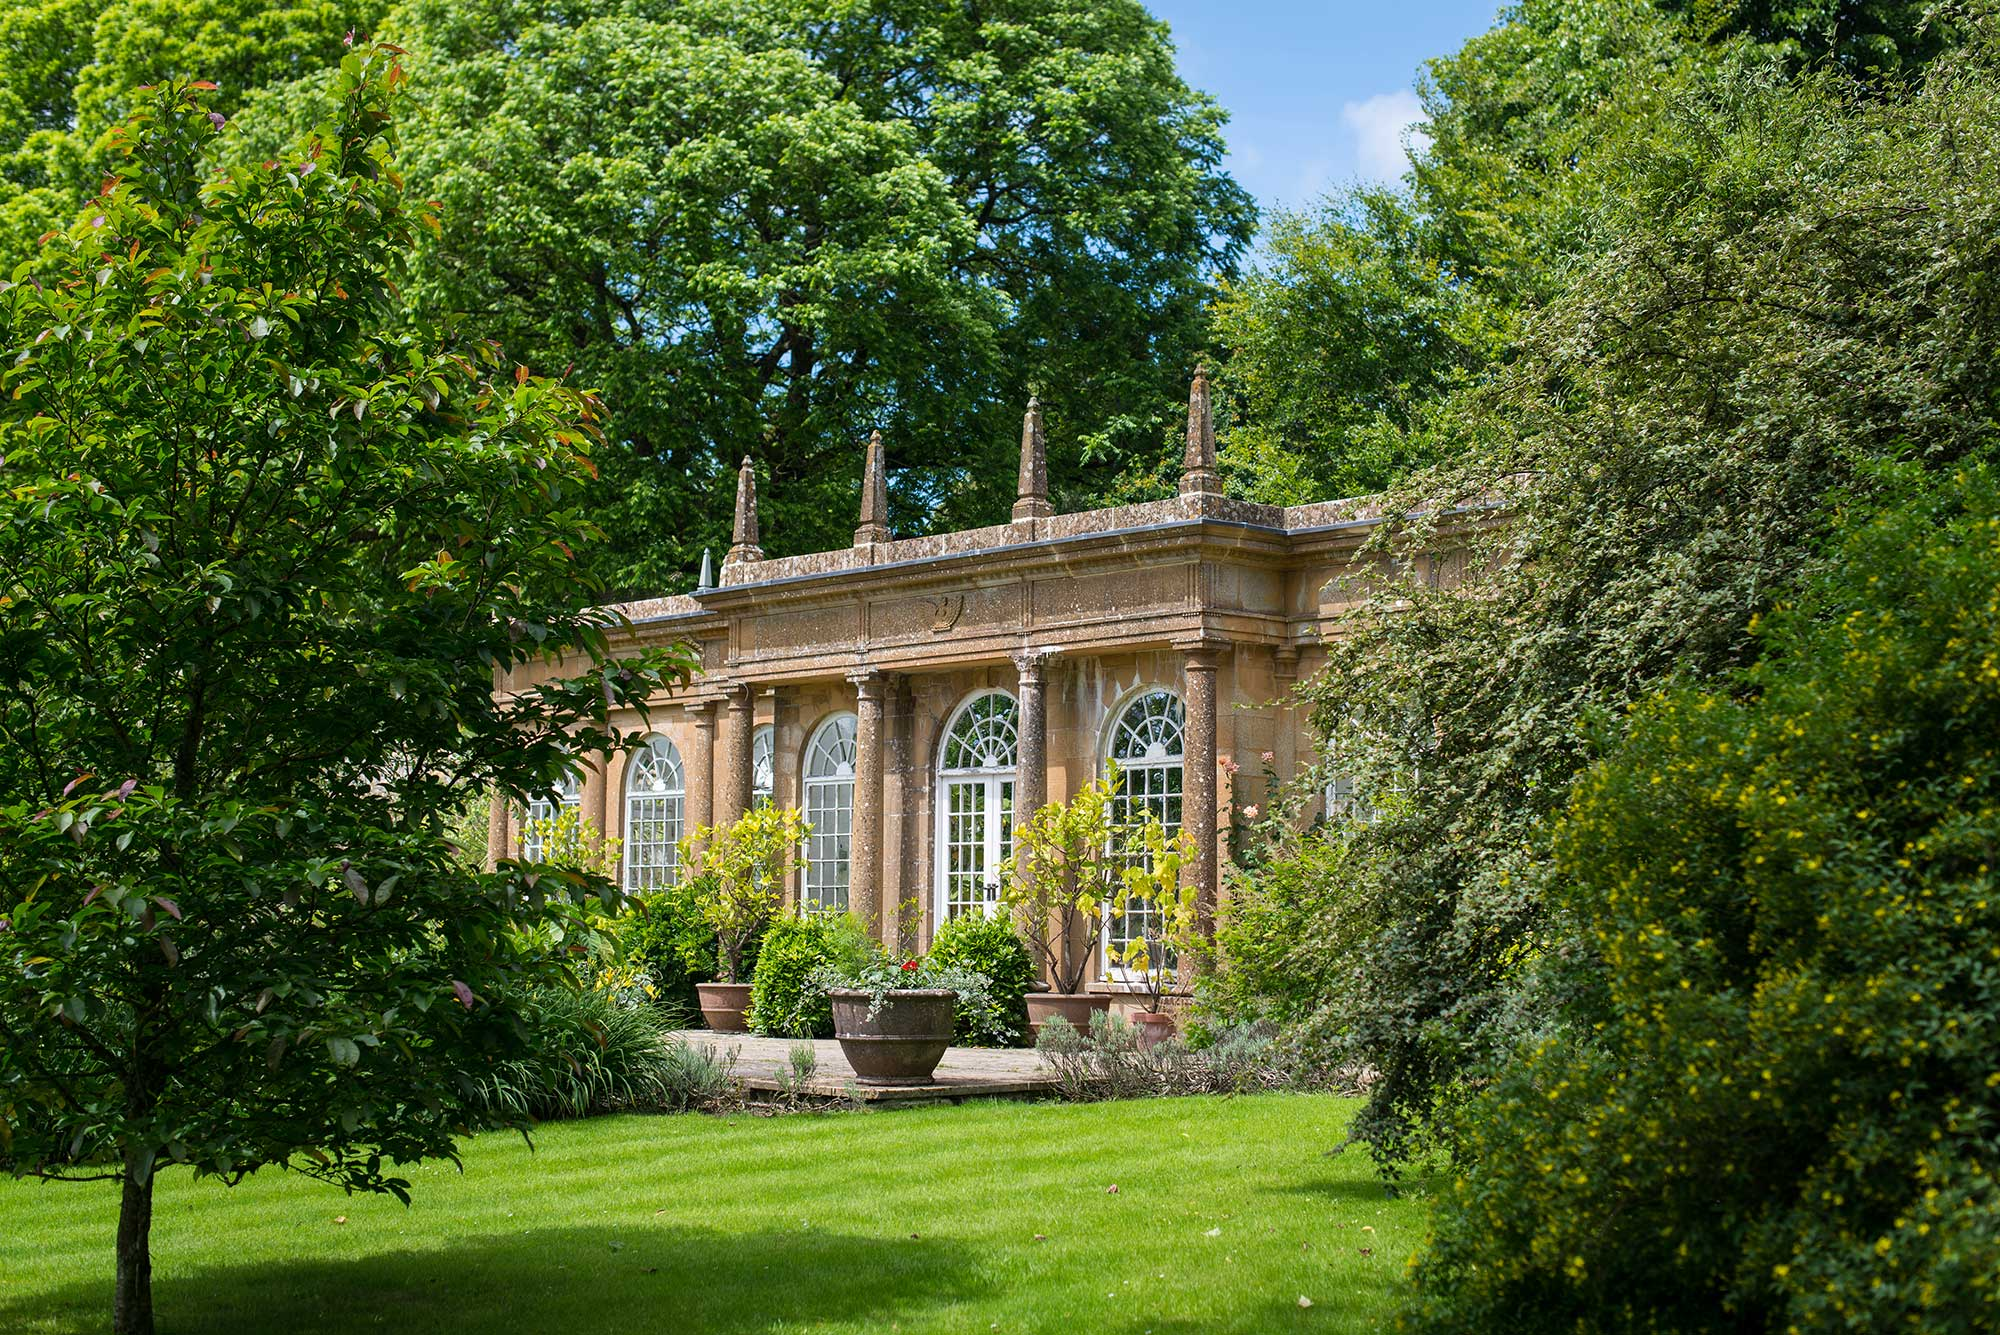 The Orangery at Mapperton House - a unique Dorset country house wedding venue